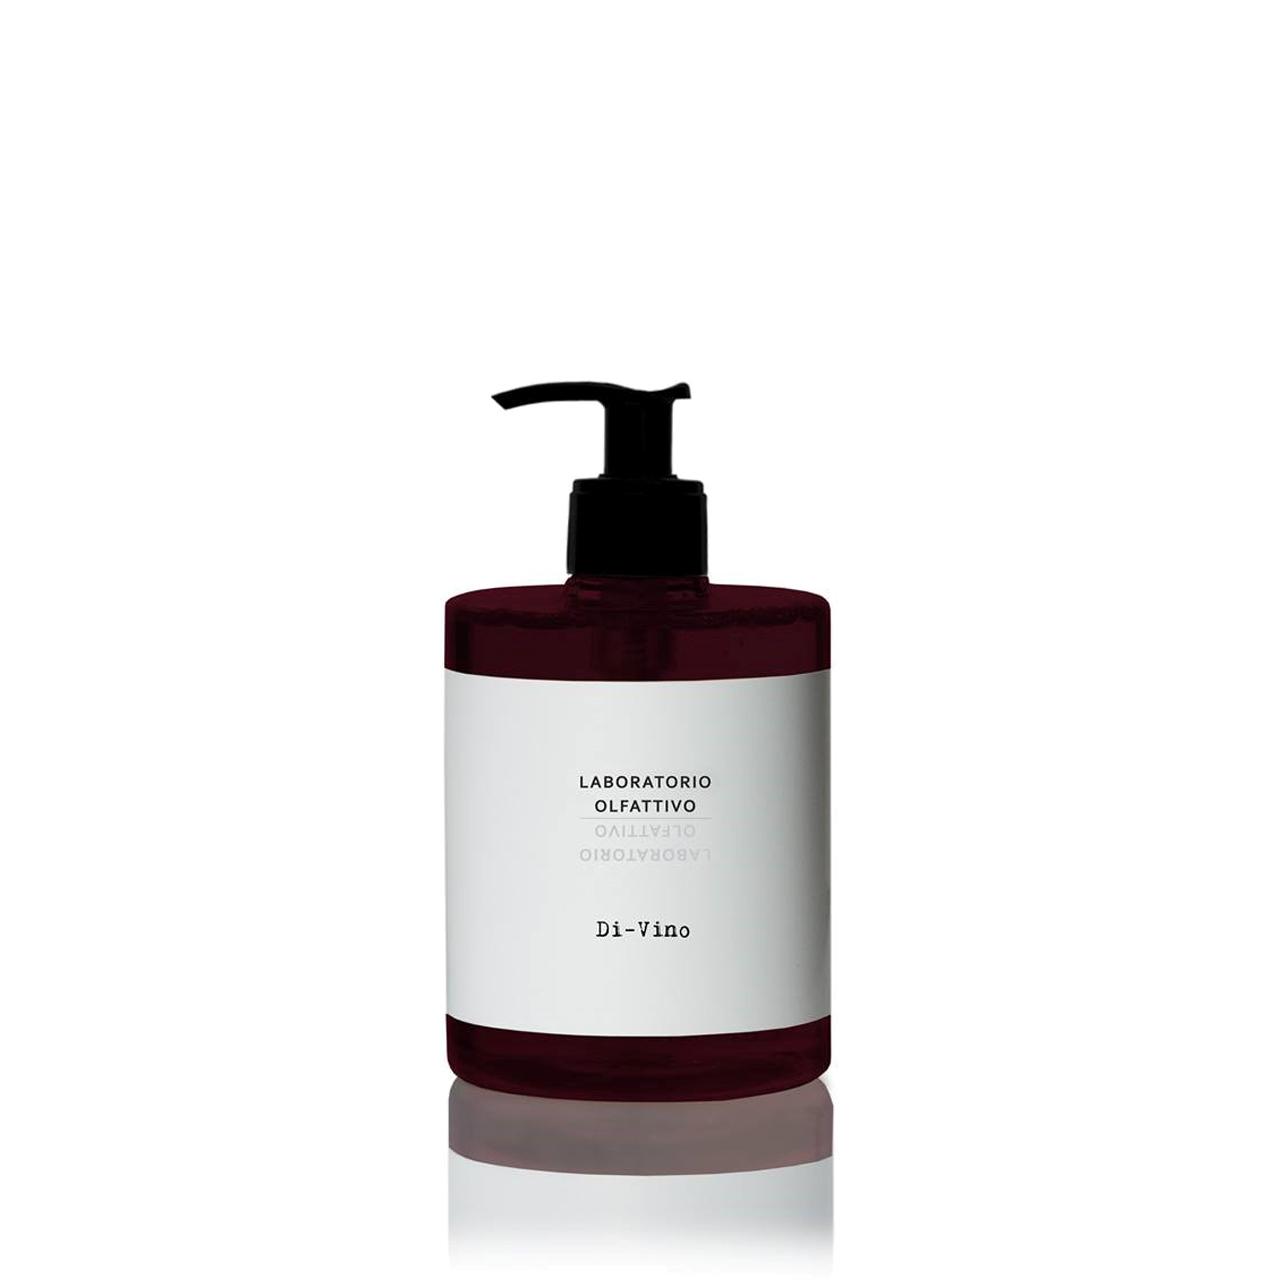 Di-vino - Hand Wash